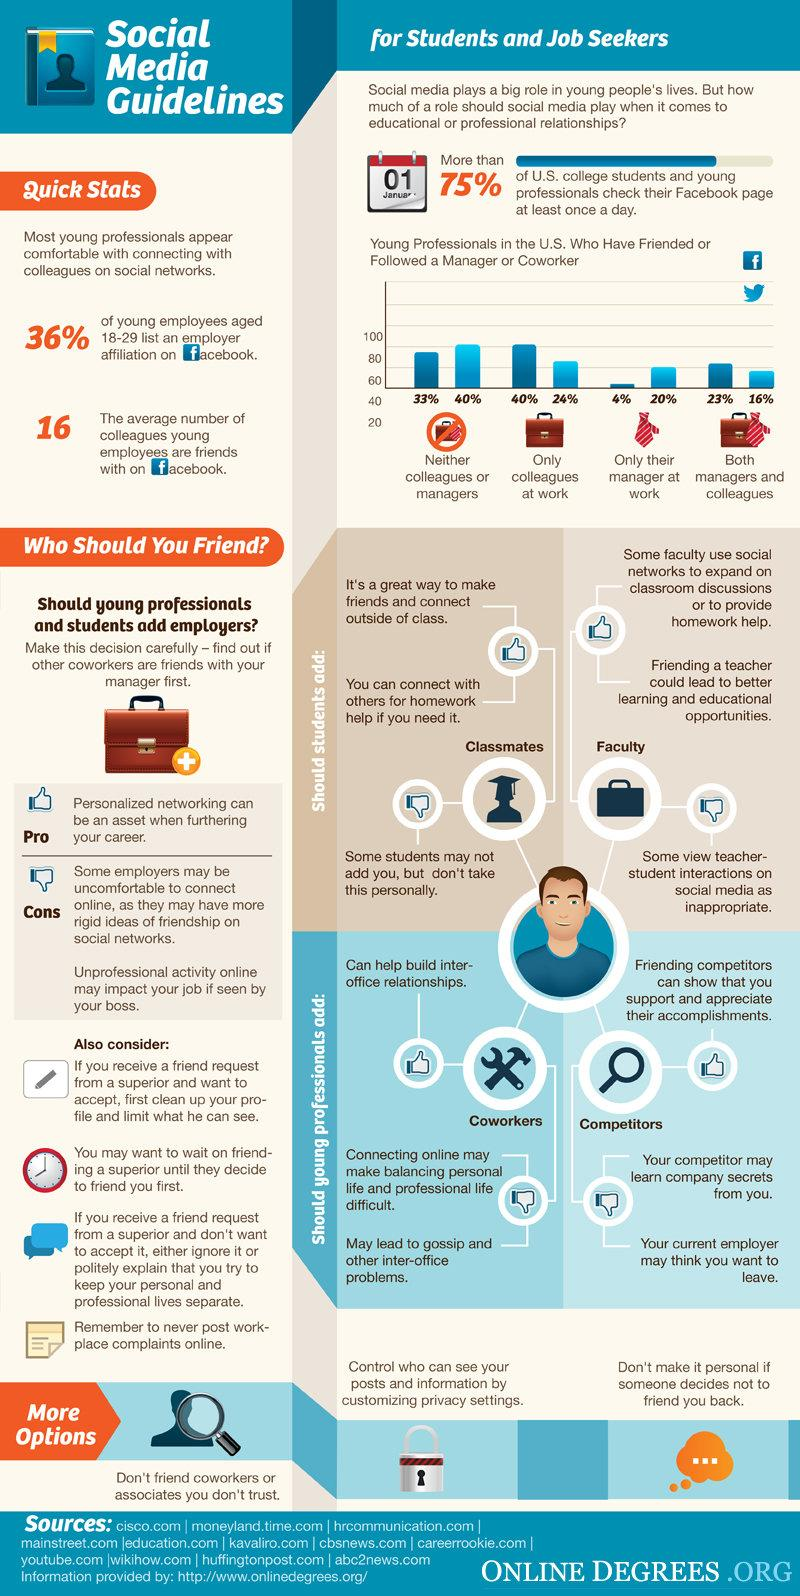 Social Media Guidlines #Infographic